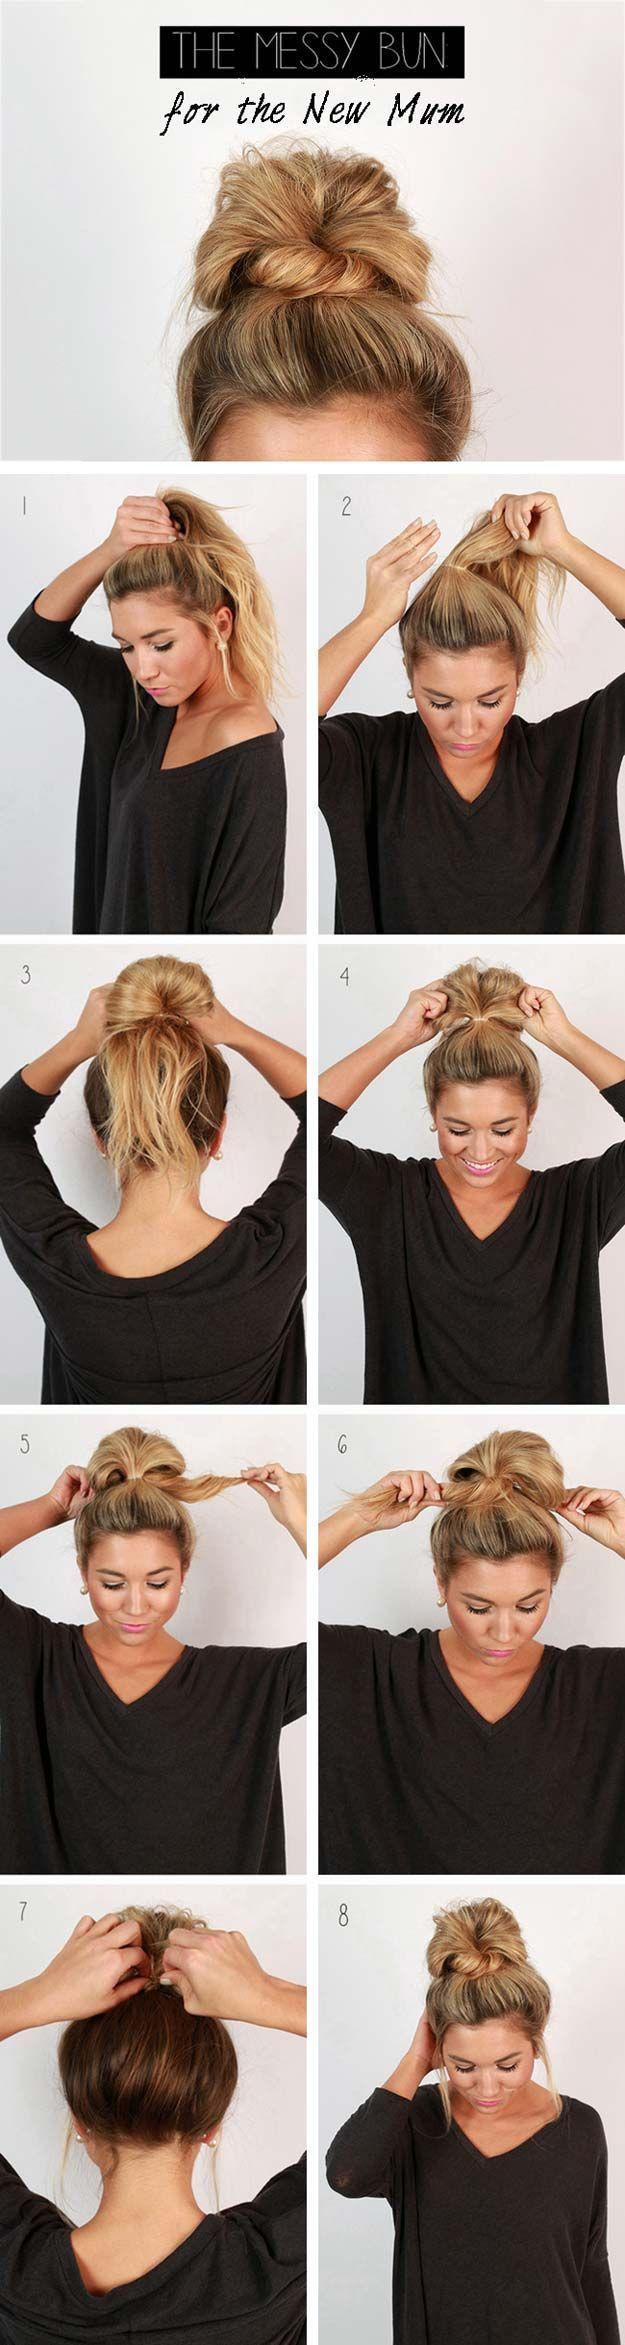 Best 25+ School picture hairstyles ideas on Pinterest ...